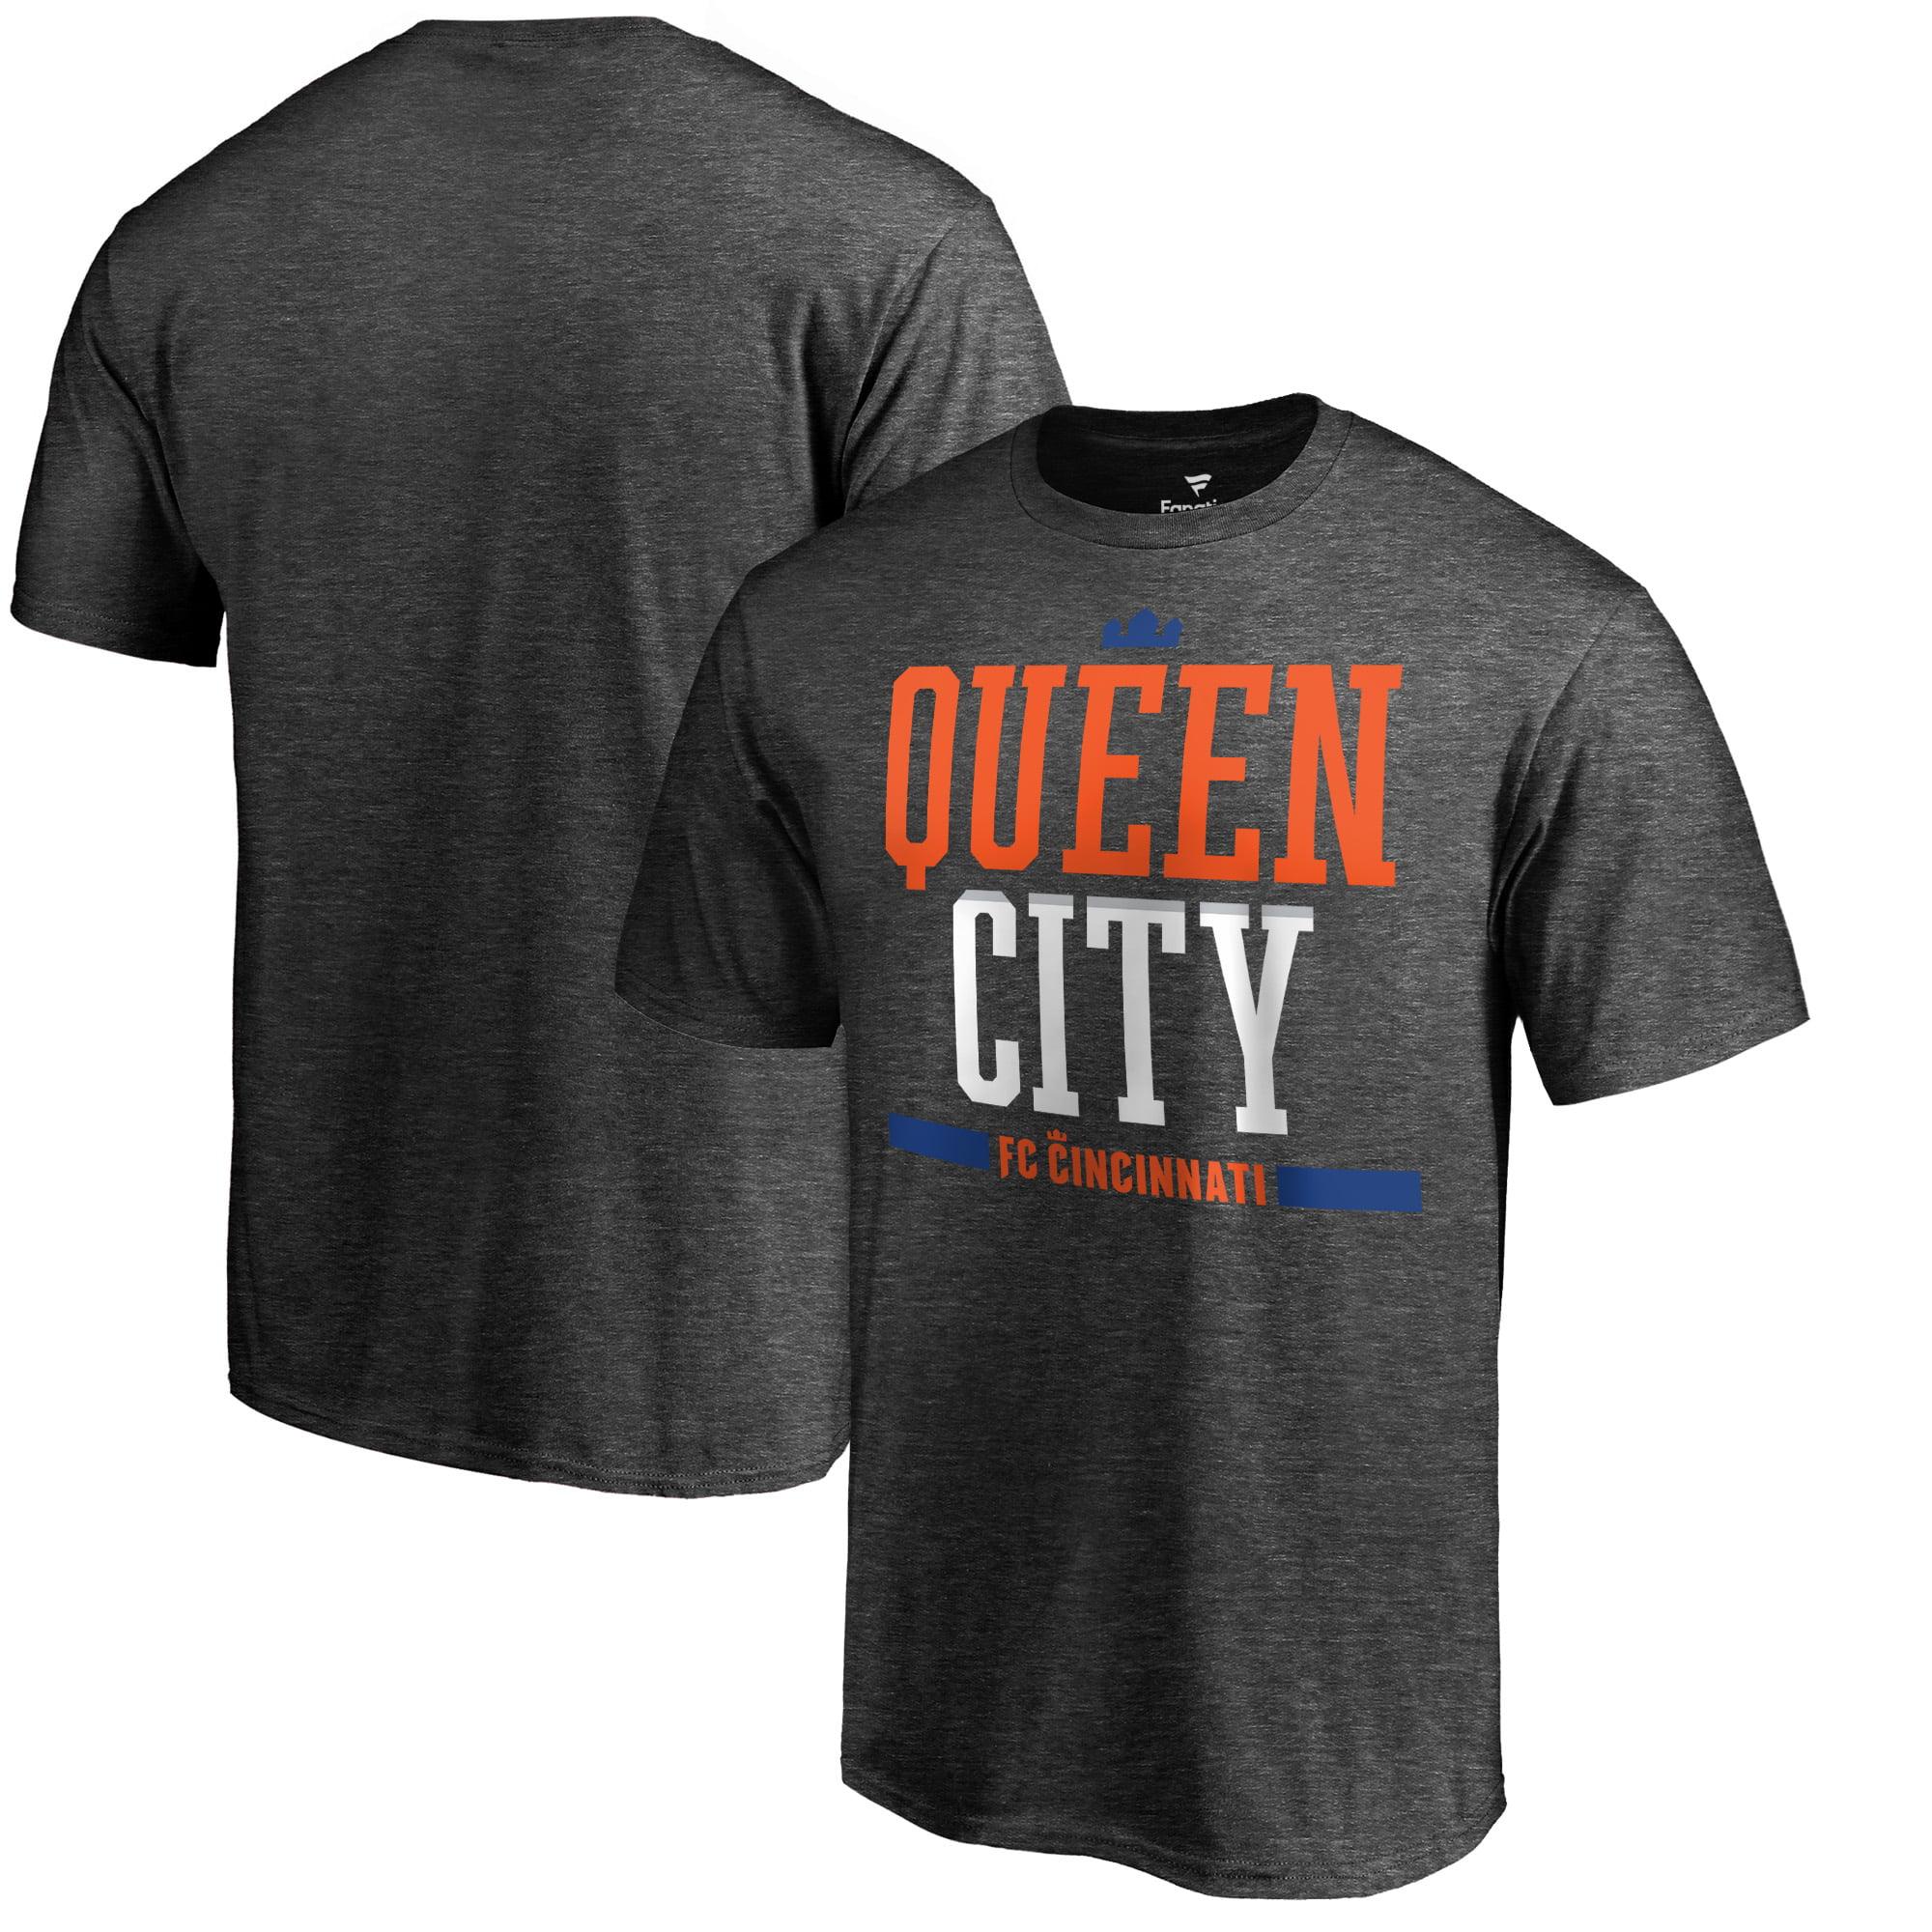 FC Cincinnati Fanatics Branded Hometown Collection Queen City T-Shirt - Heather Gray